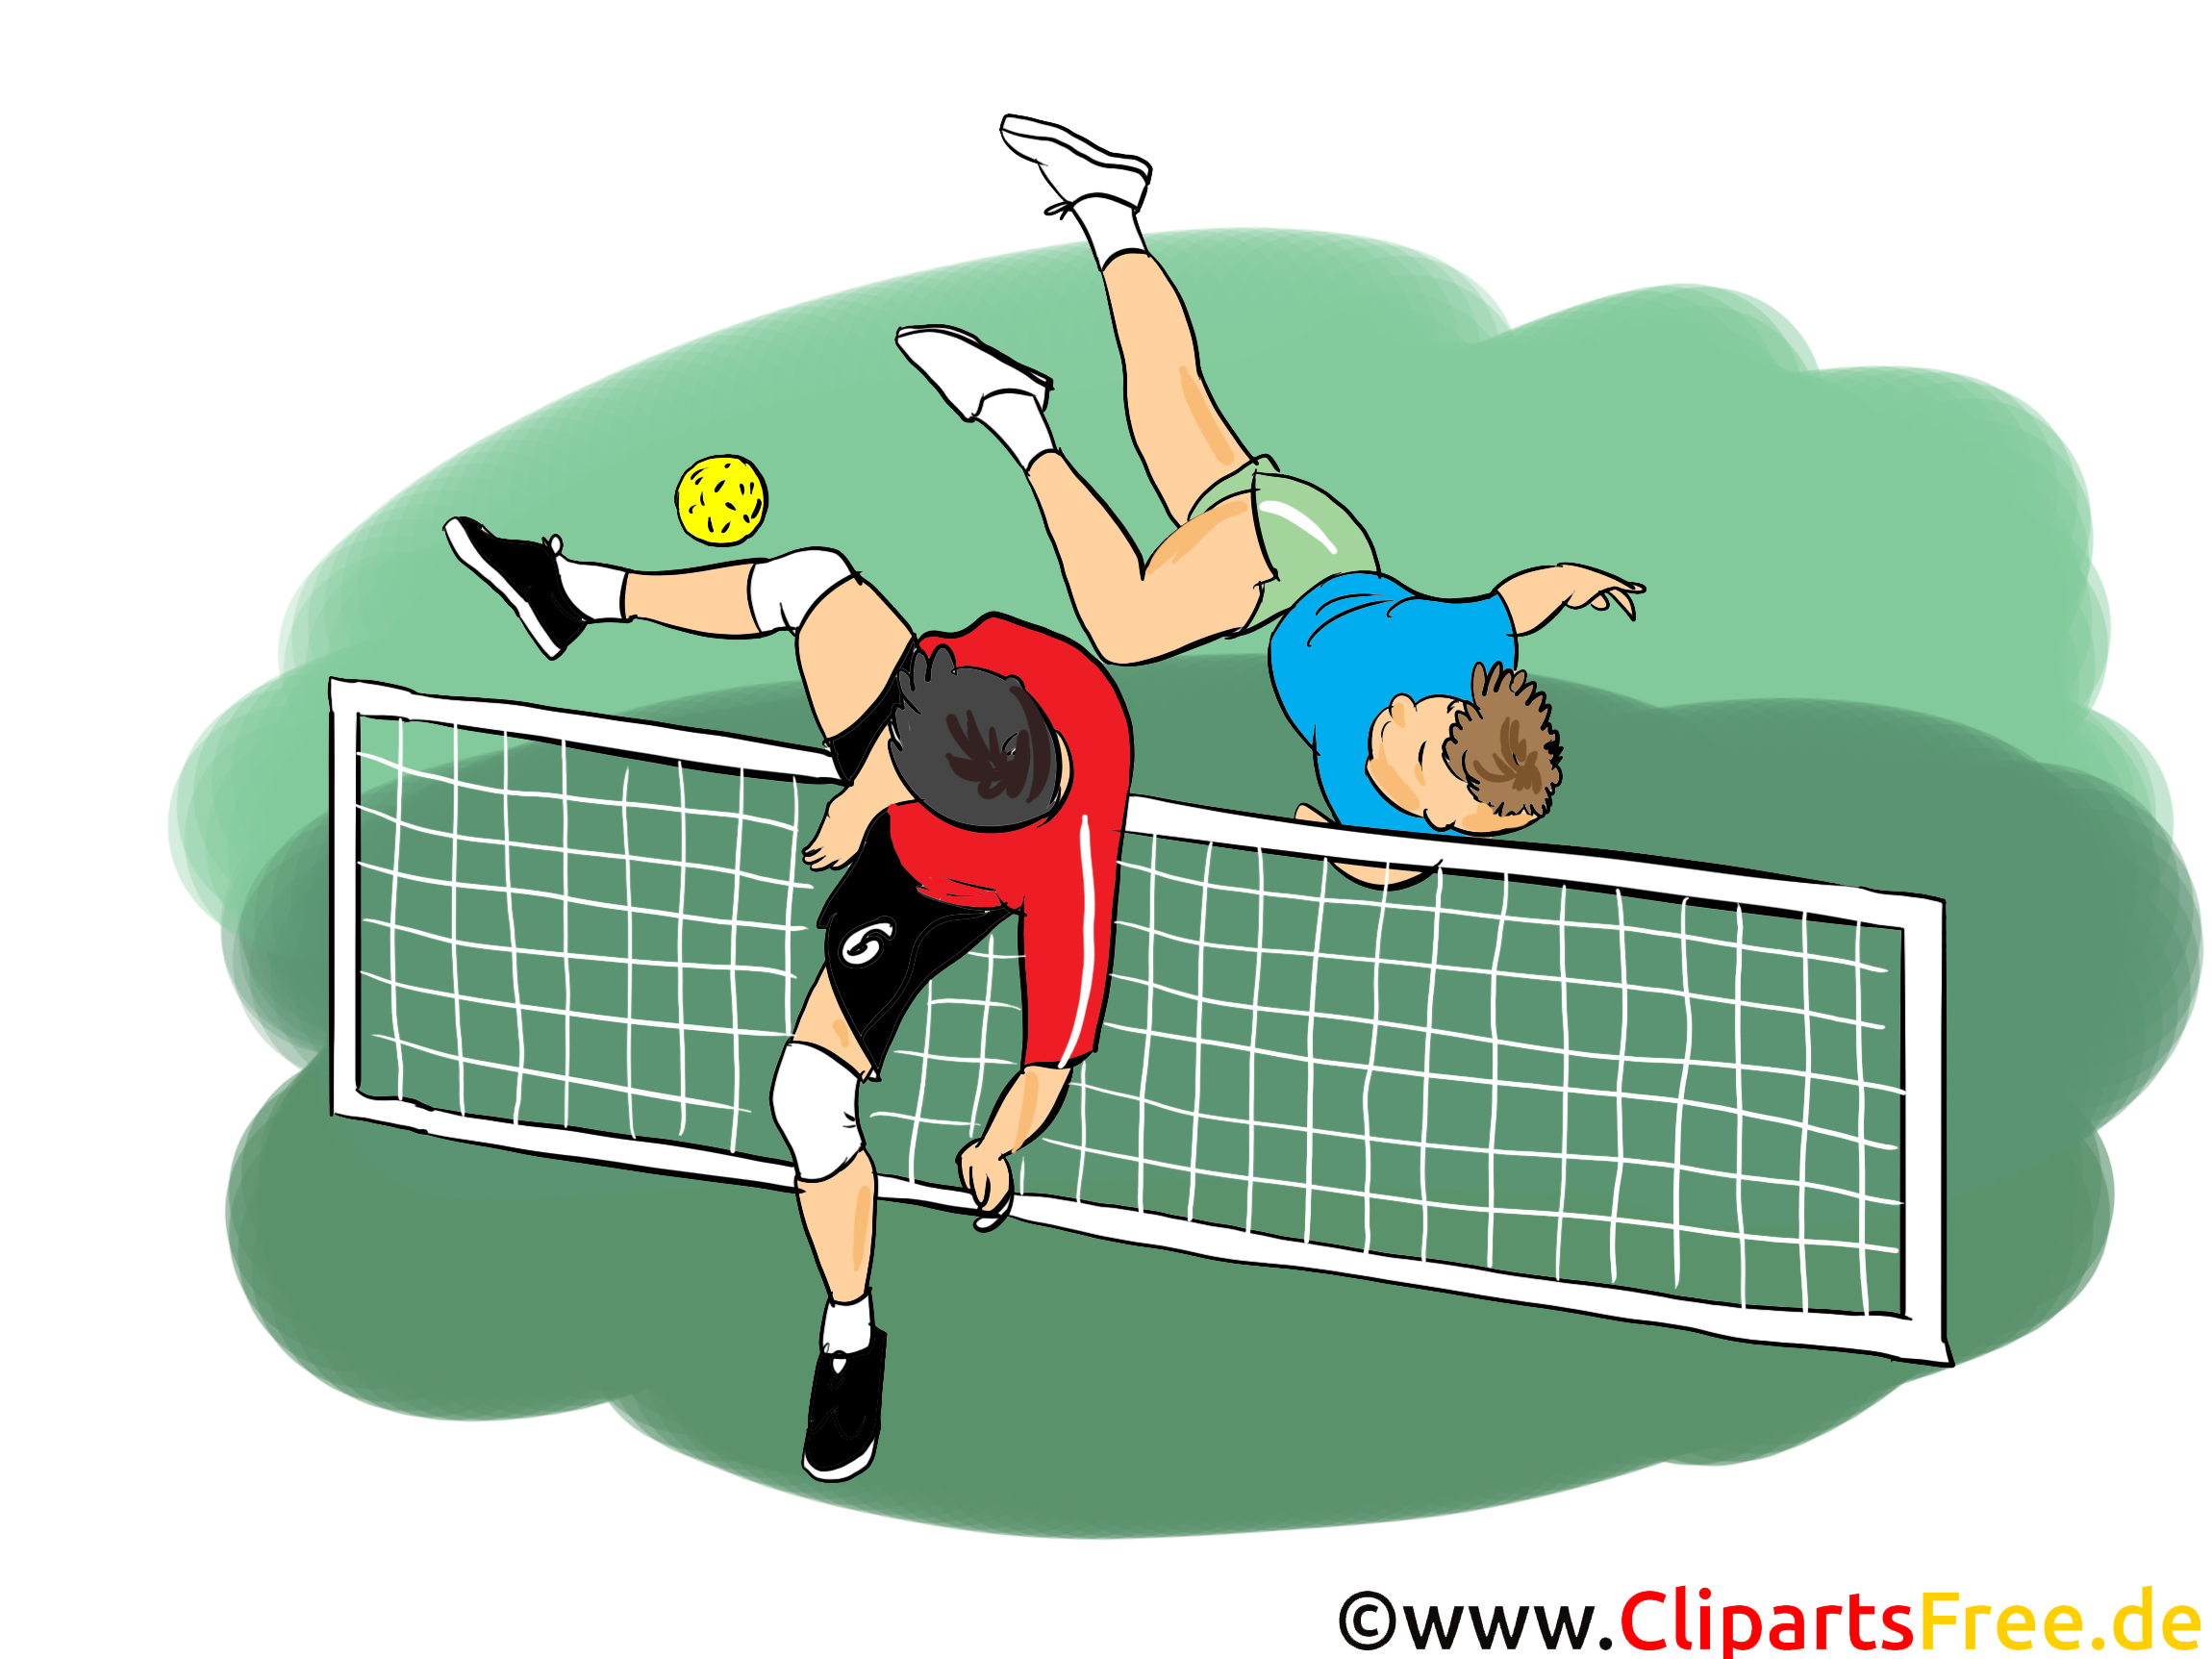 Tennis-ballon dessins - Futnet clipart gratuit - Sport dessin, picture ...